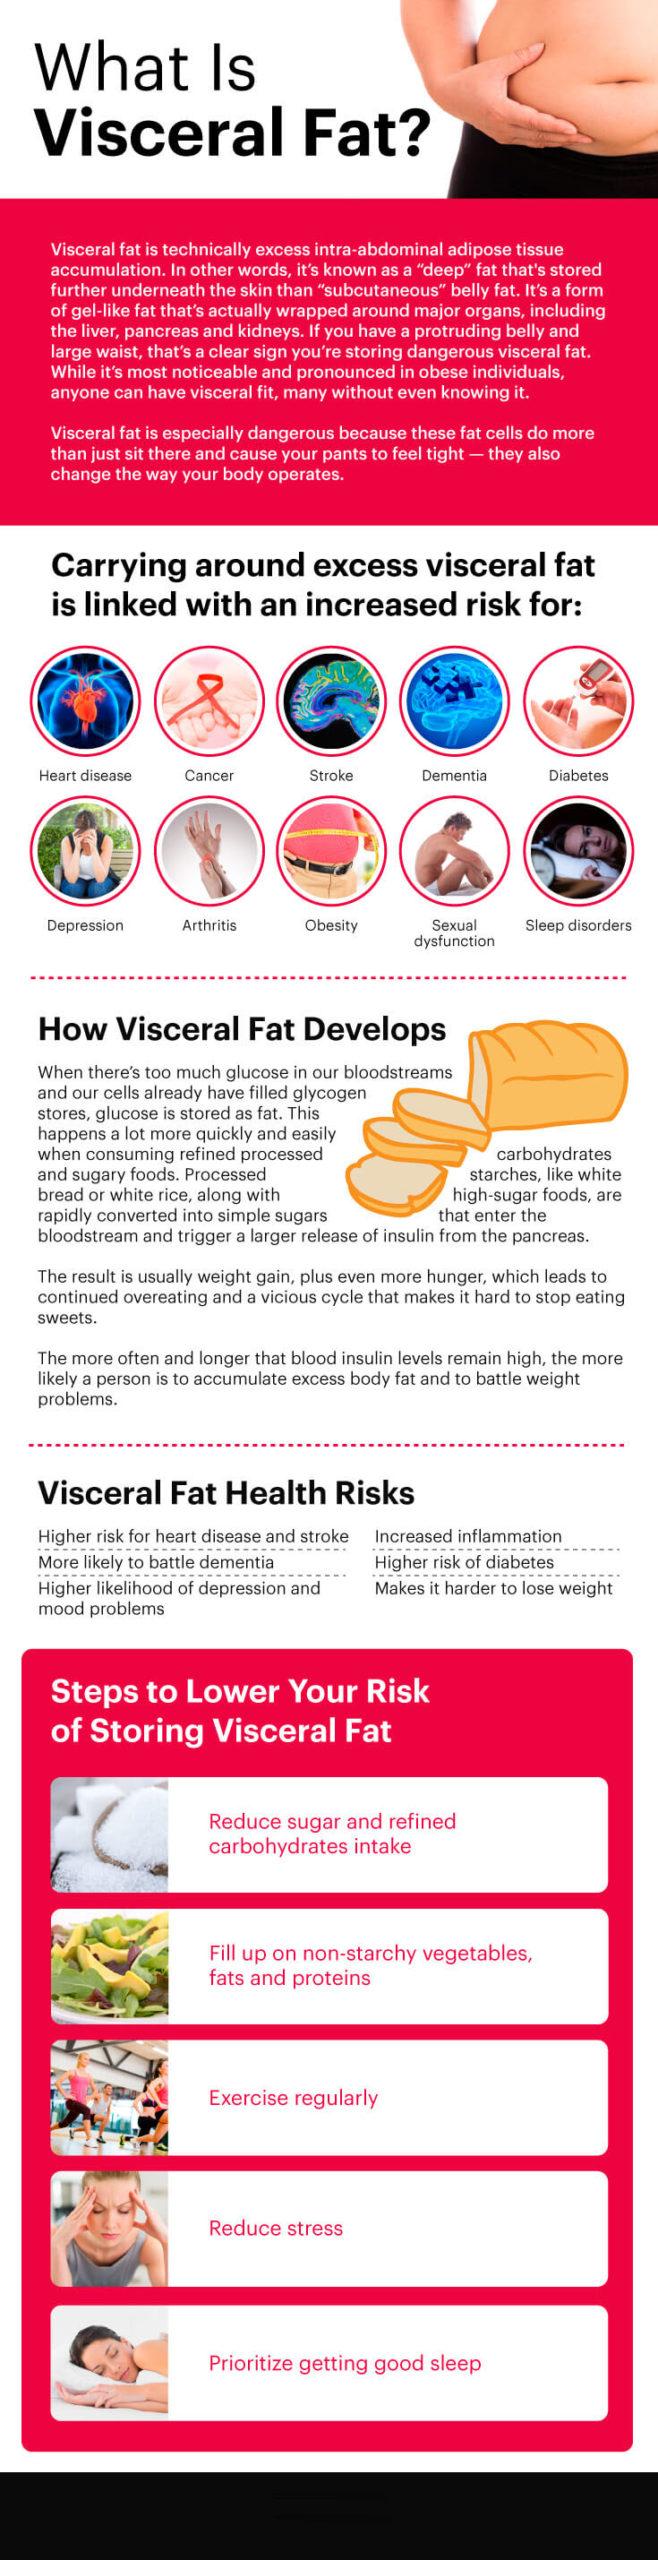 Visceral fat facts